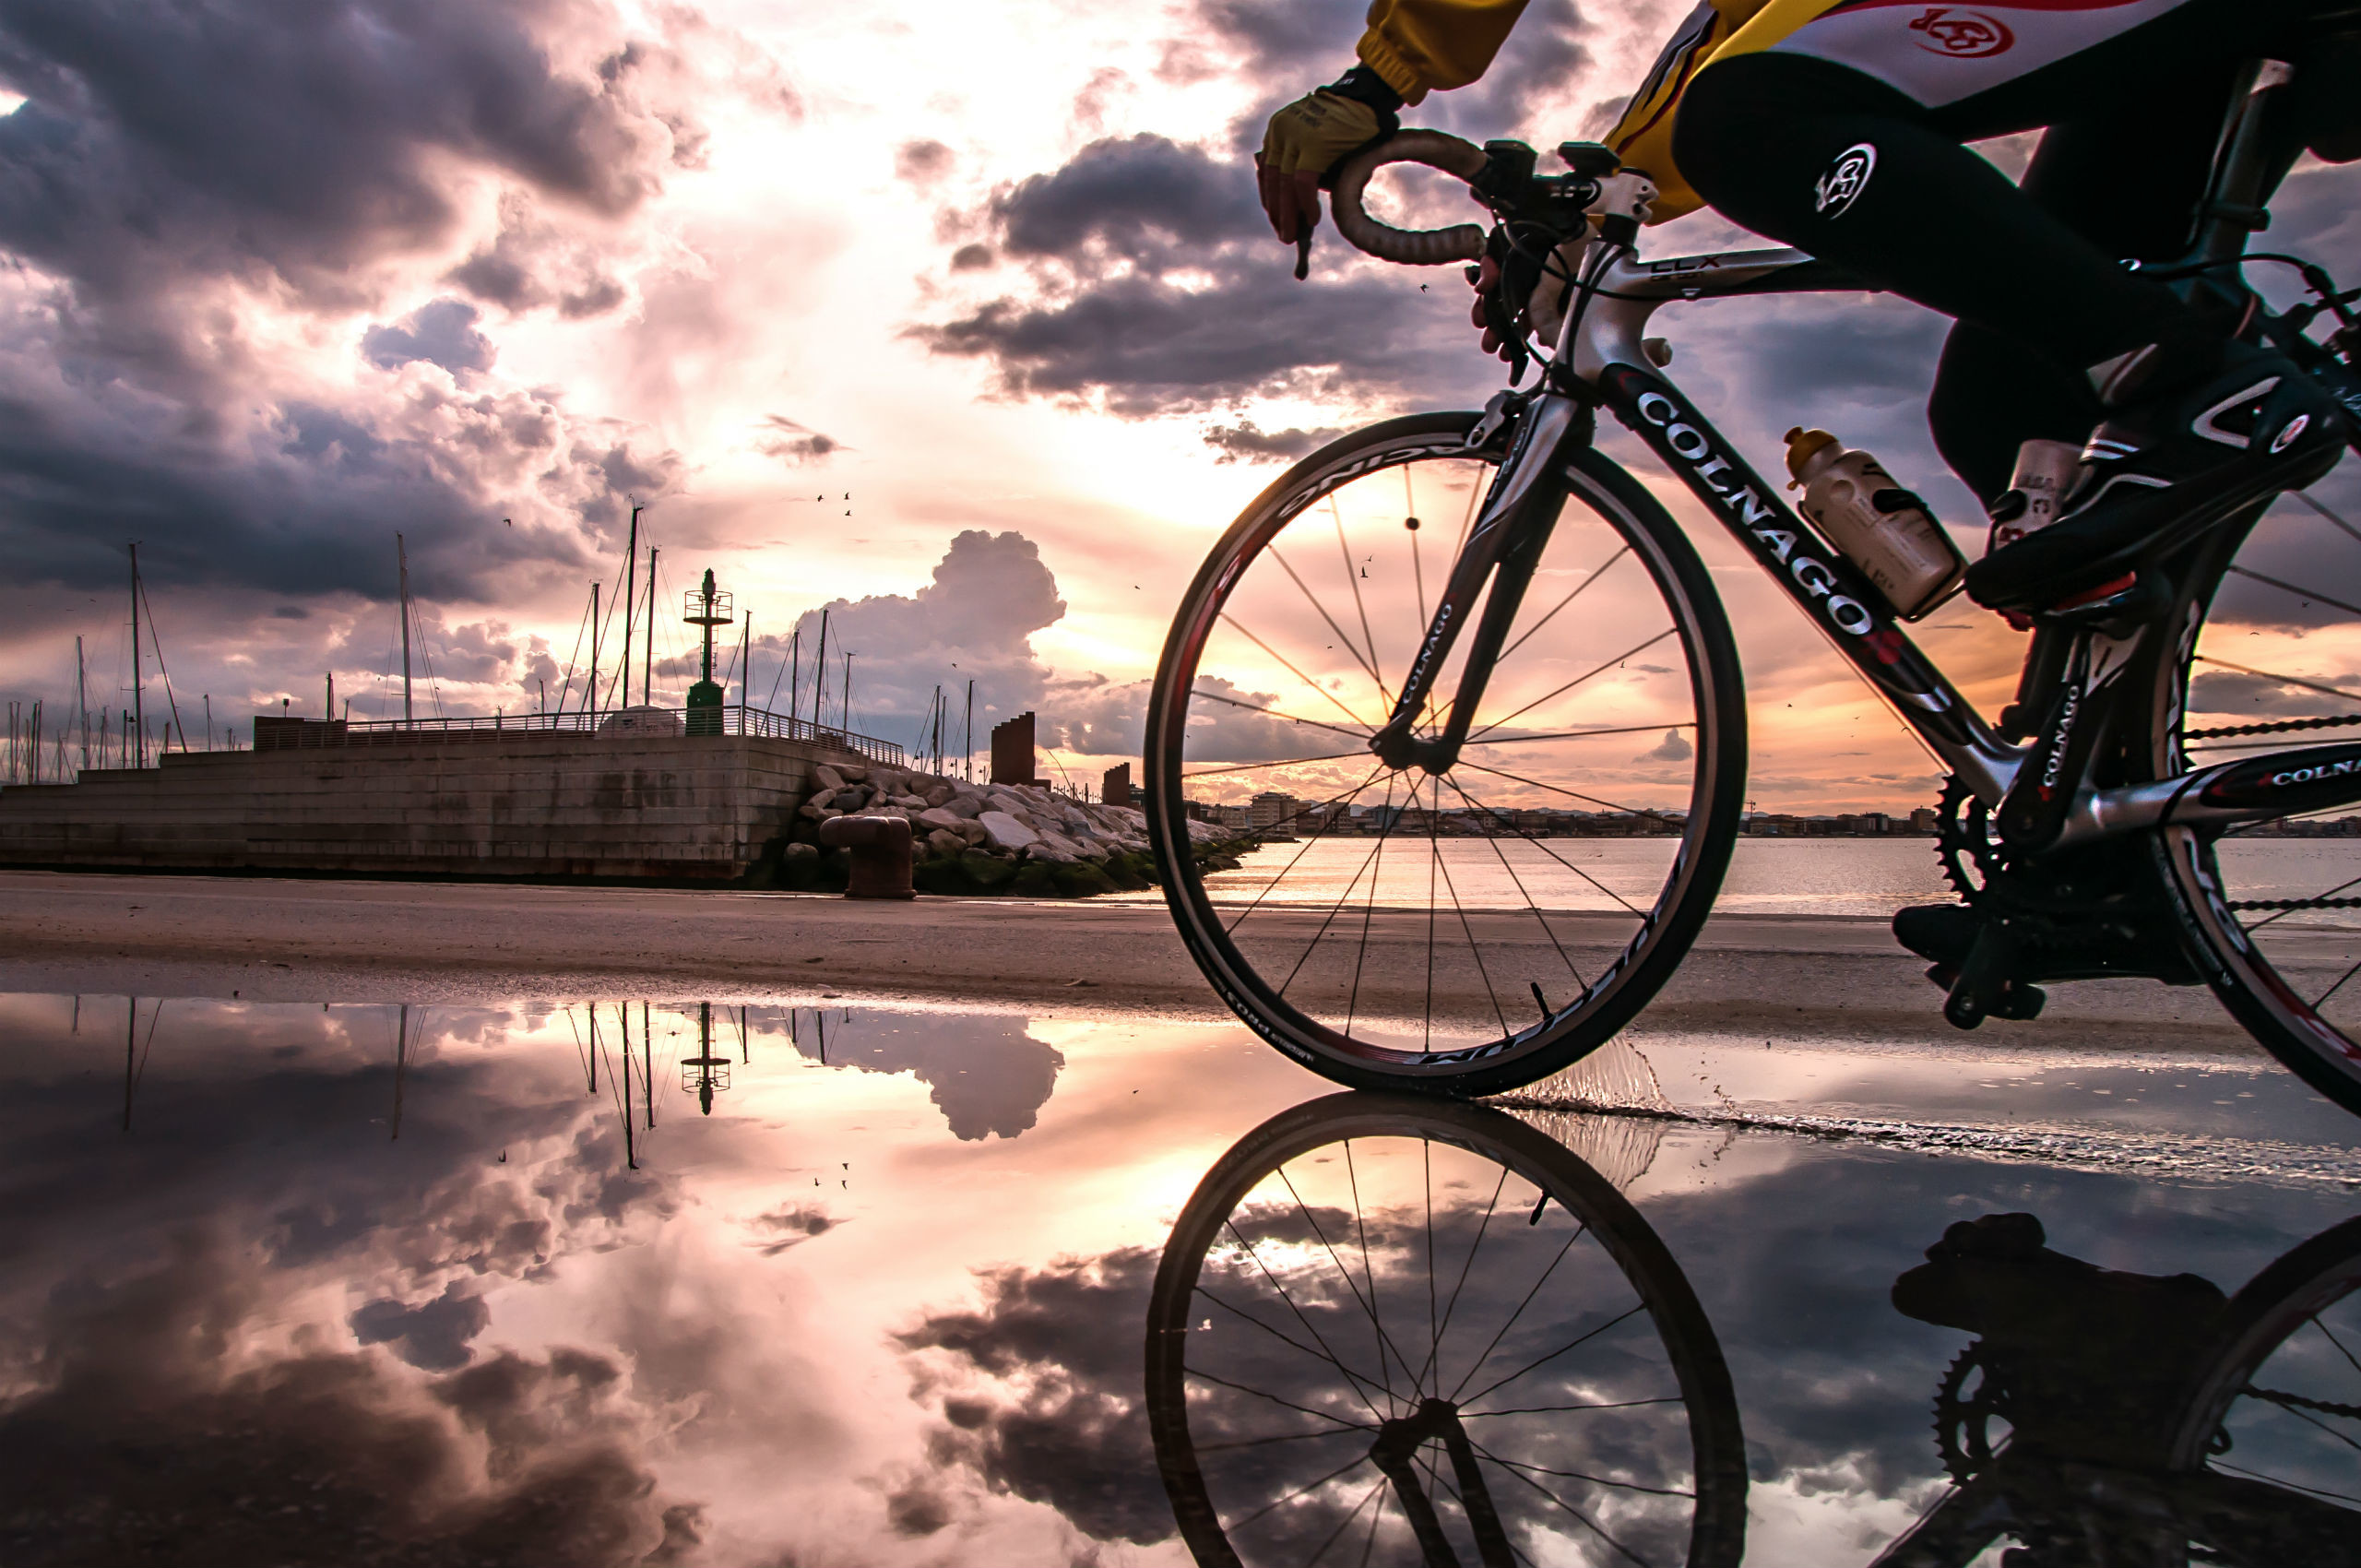 2560x1700, Road Bikes Wallpapers - Bicycle Hd - HD Wallpaper